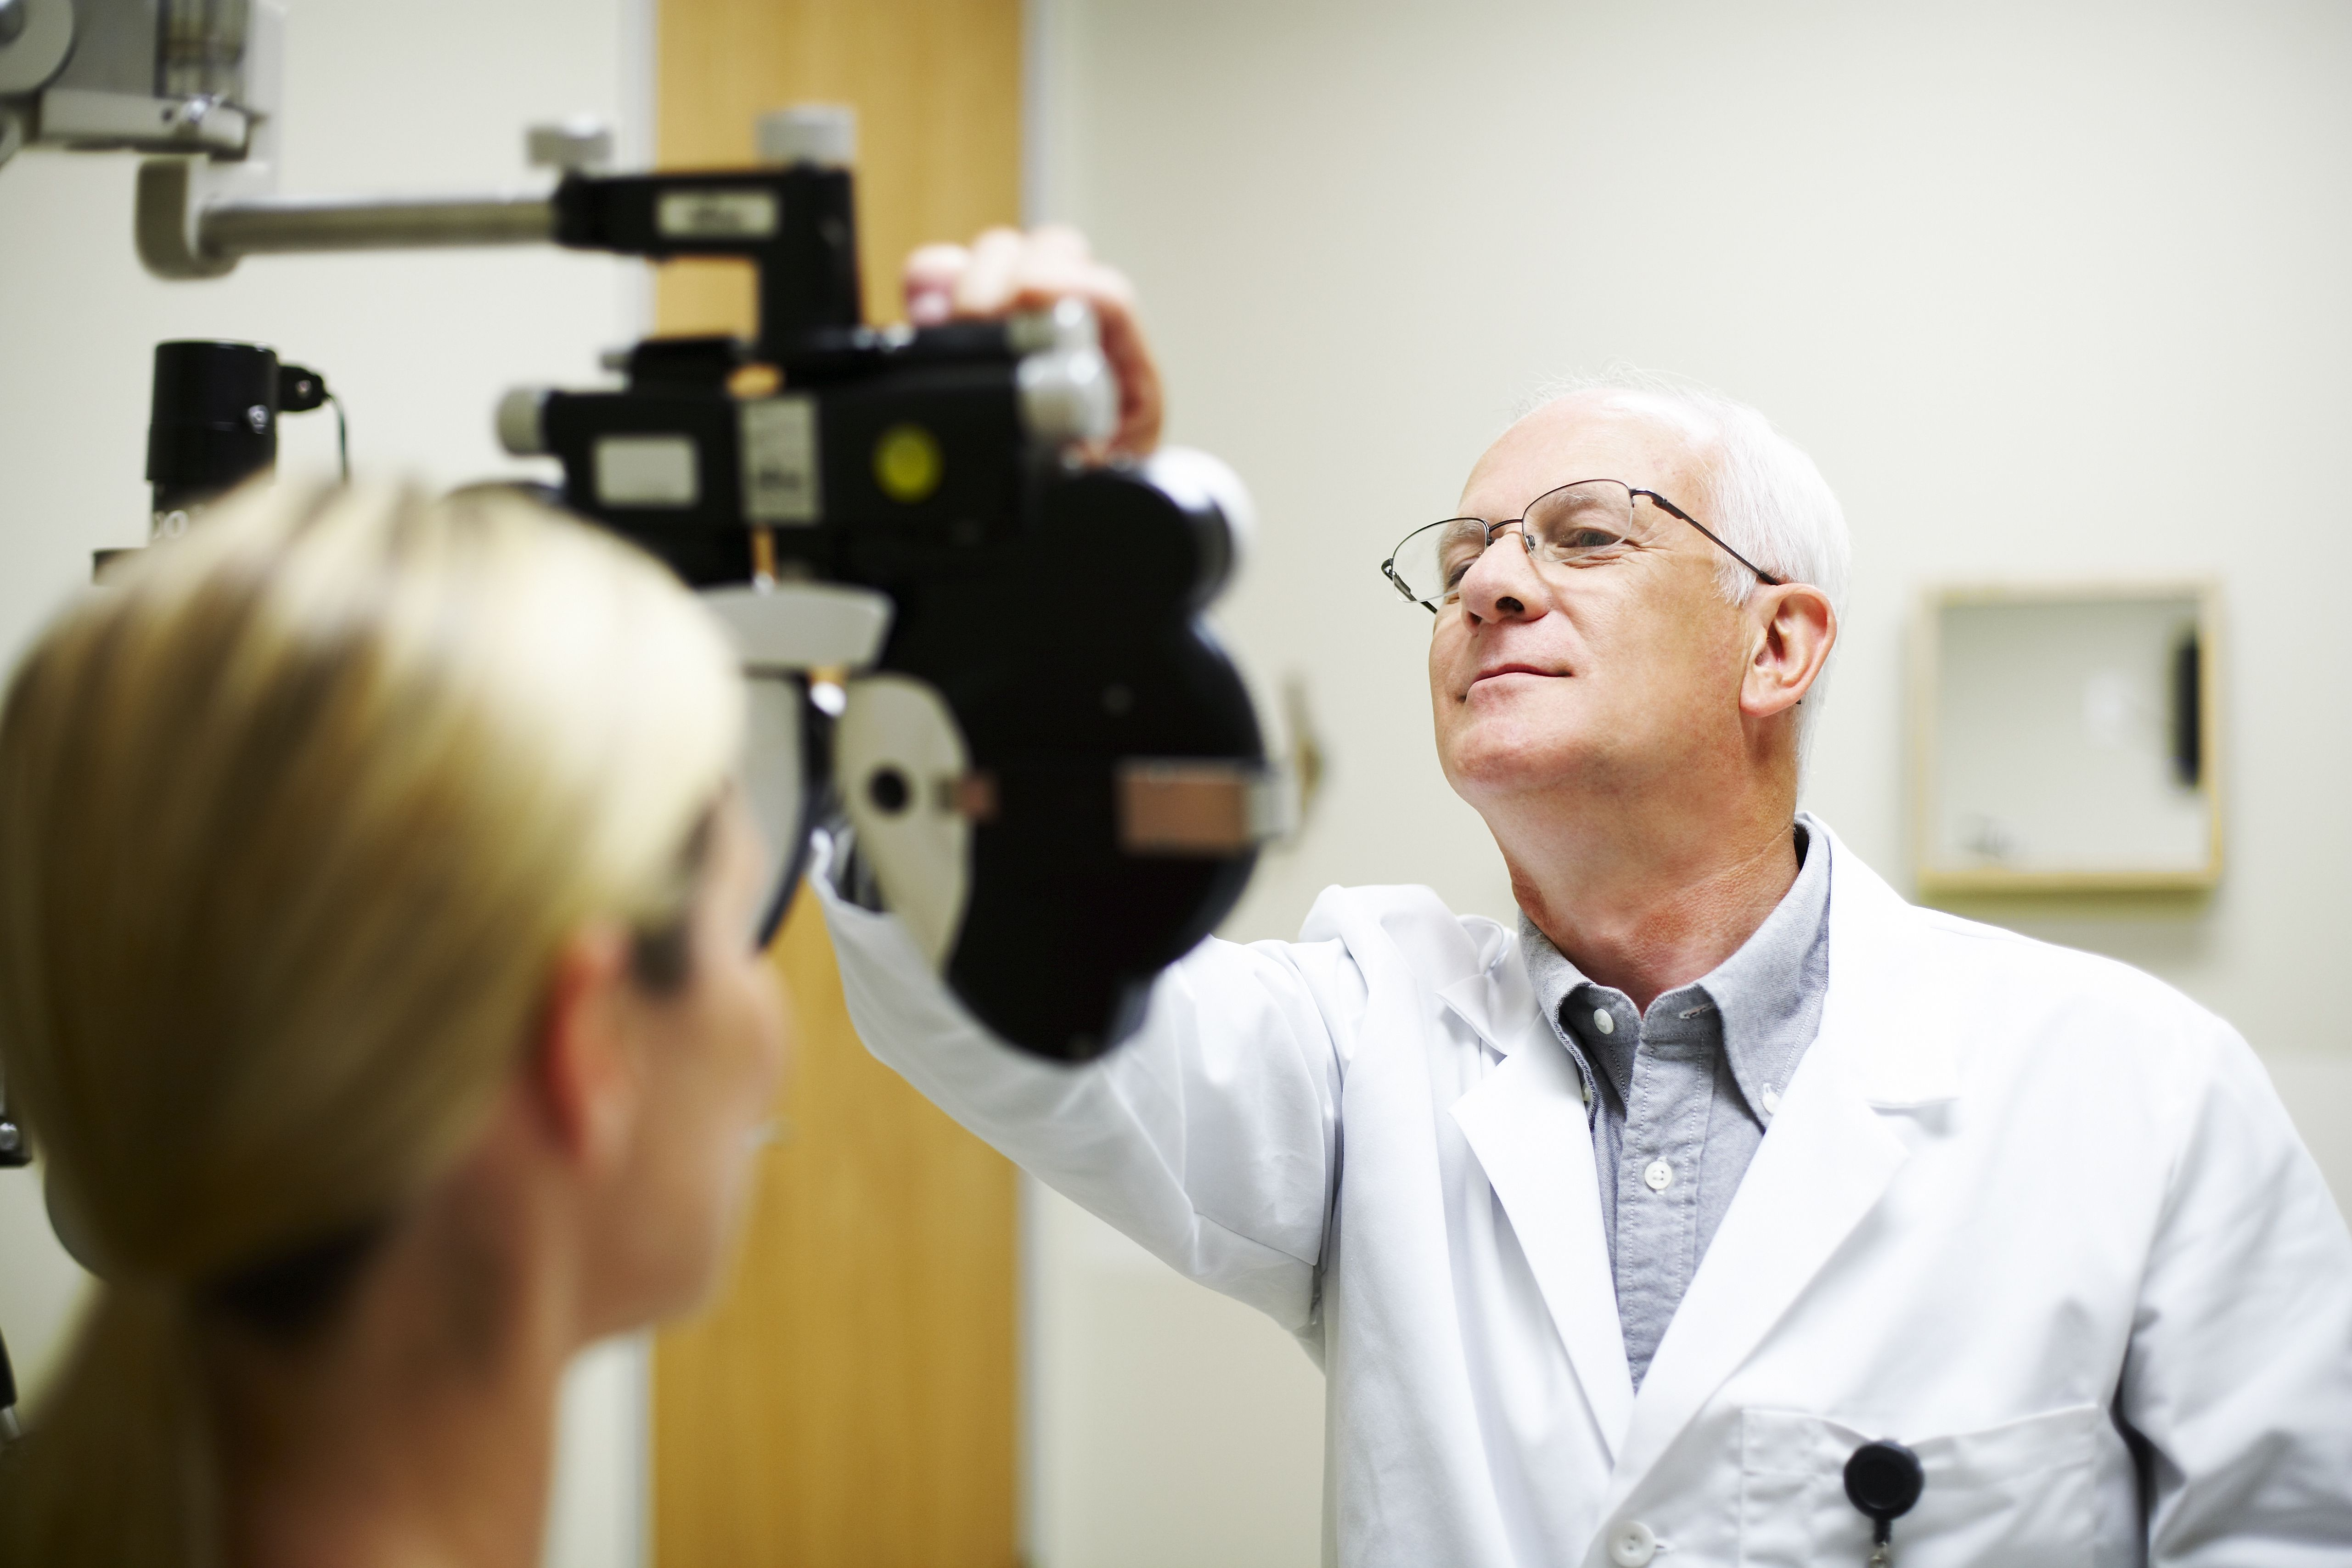 Opthamologist measuring patient's eyesight